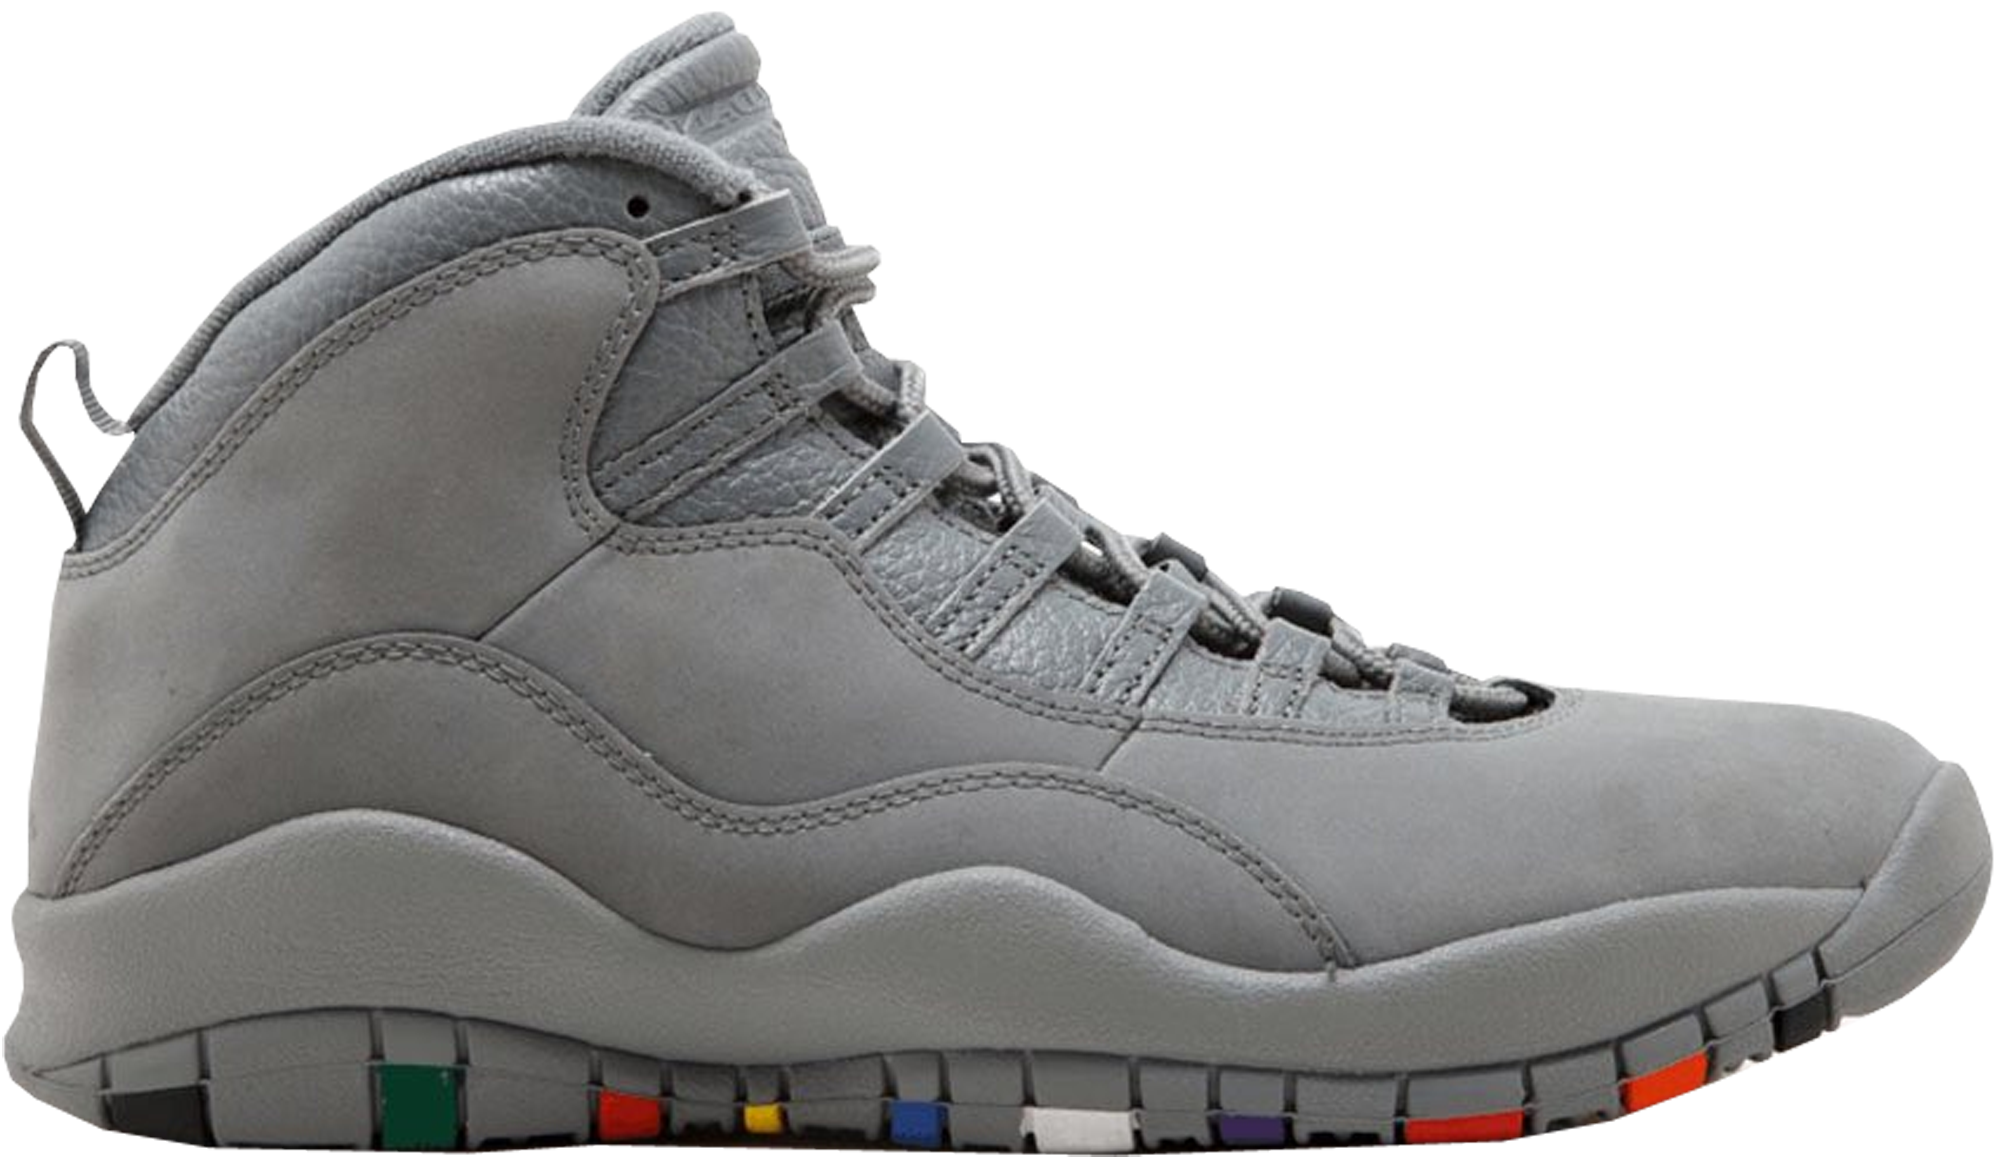 Jordan 10 Retro Cool Grey